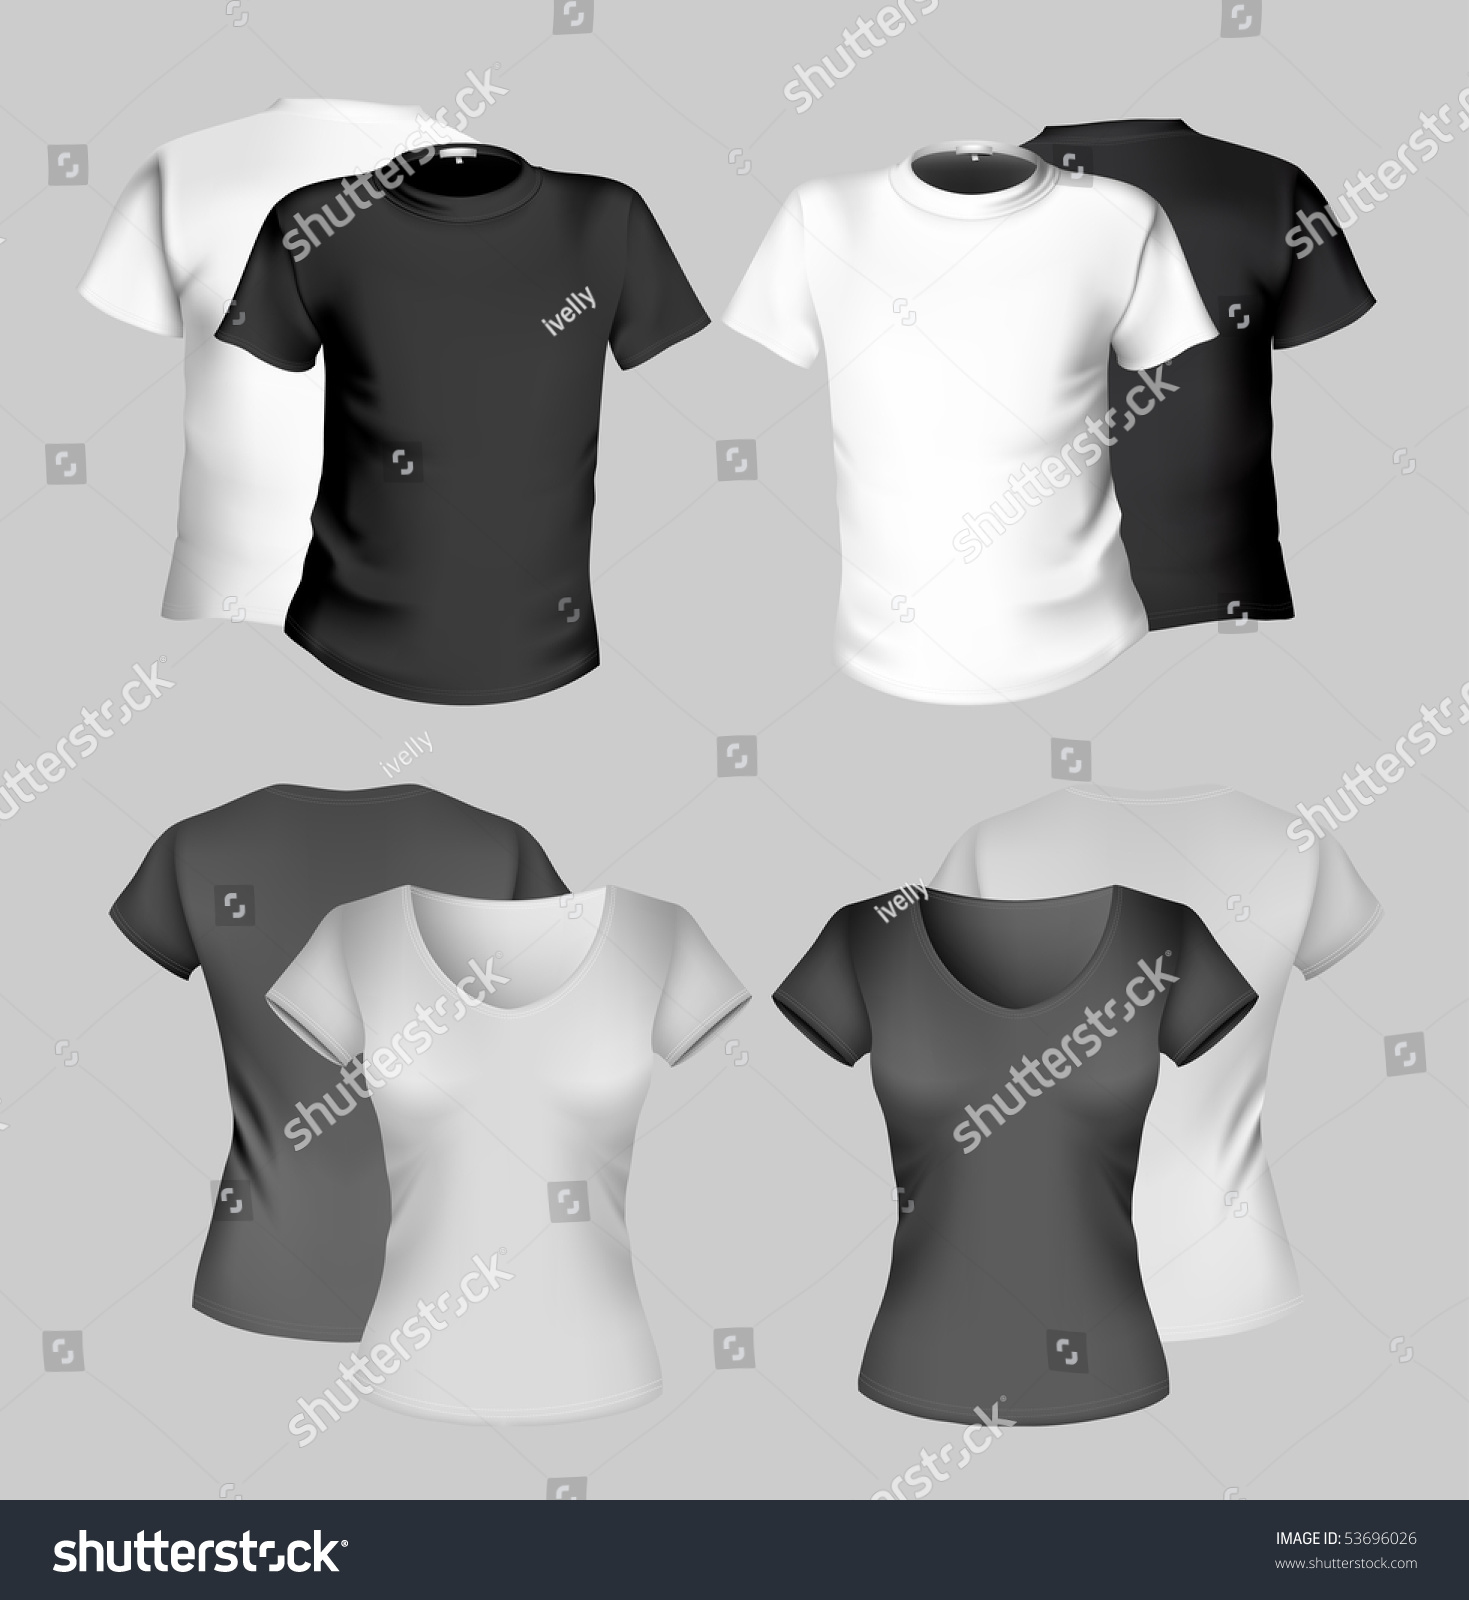 Shirt design illustrator template - Vector Illustration T Shirt Design Template Men And Women Black And